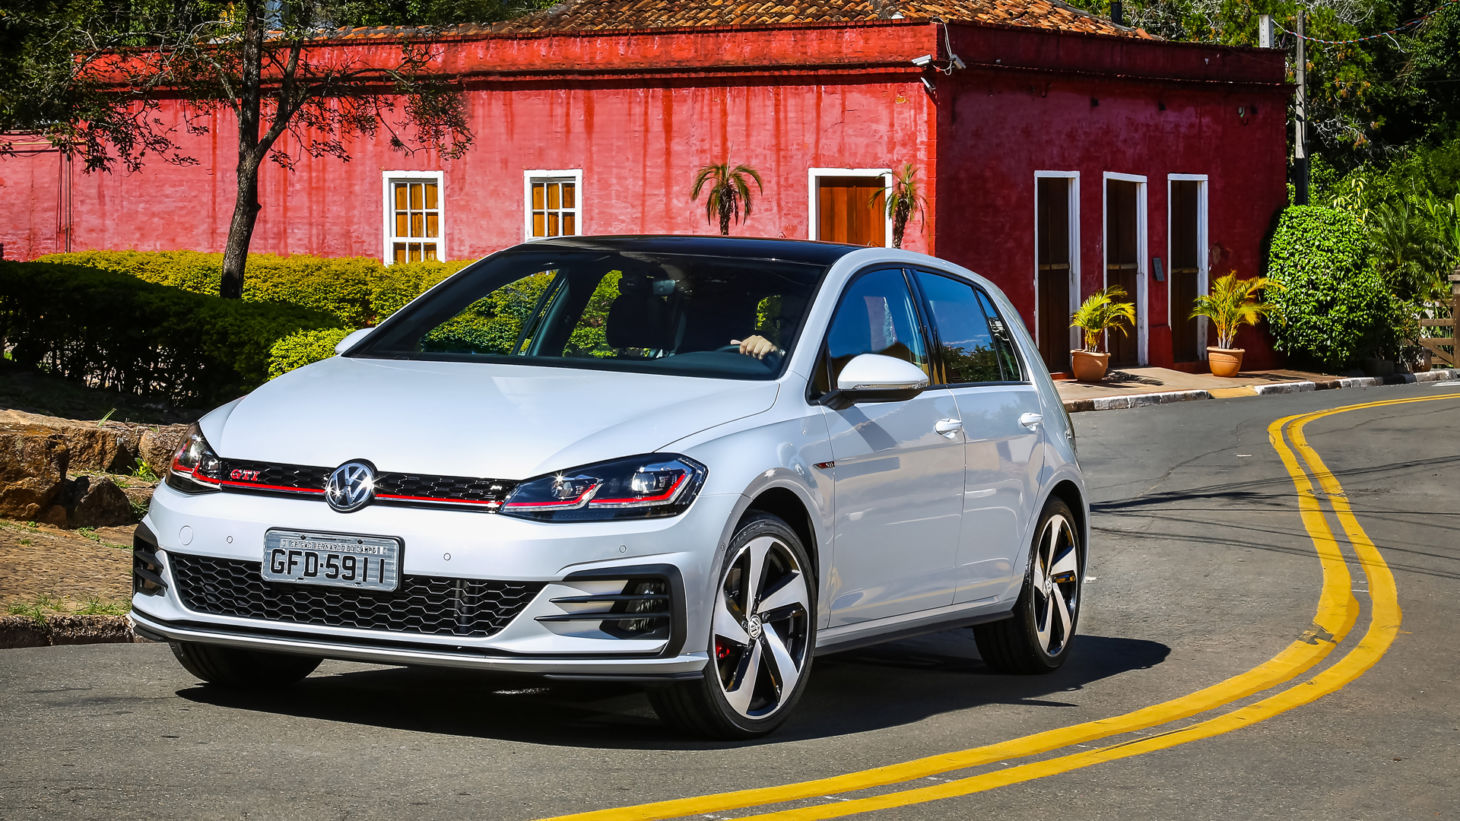 vw-golf-gti-1460x821 Antigos carros esportivos Volkswagen: relembre as siglas famosas